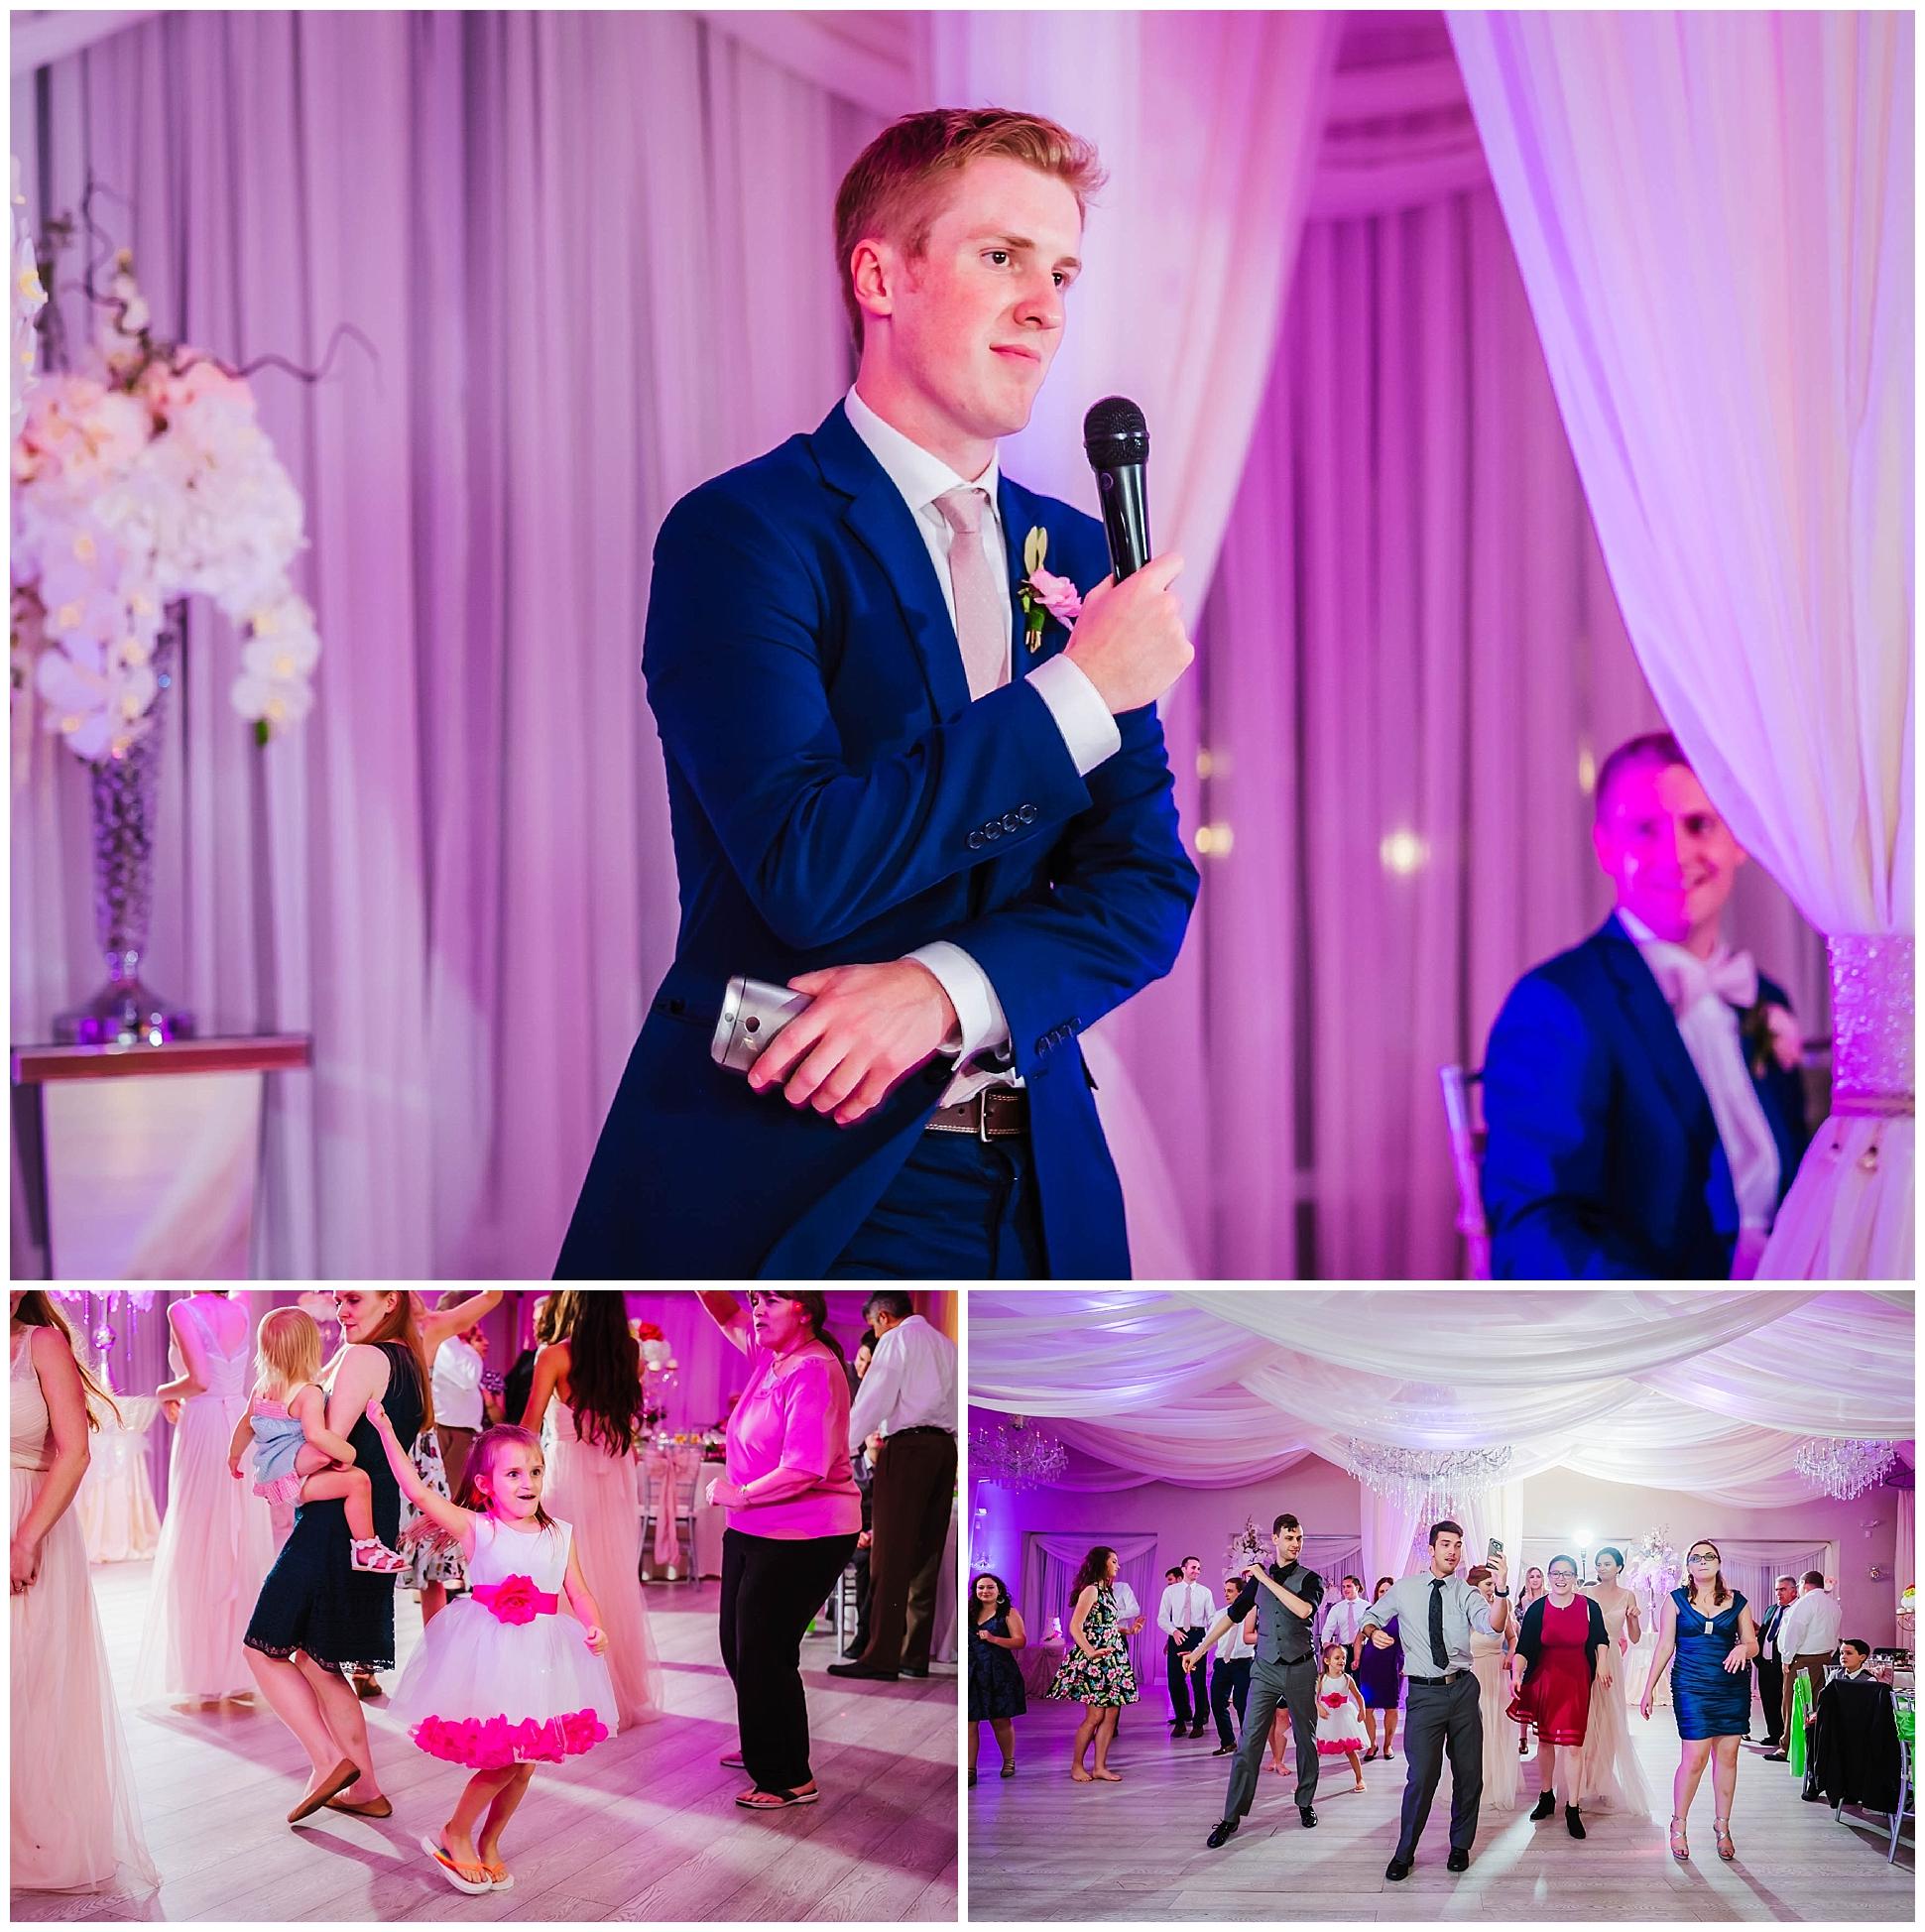 st-pete-wedding-photographer-sunken-gardens-crystal-ballroom-princess-dancer_0194.jpg